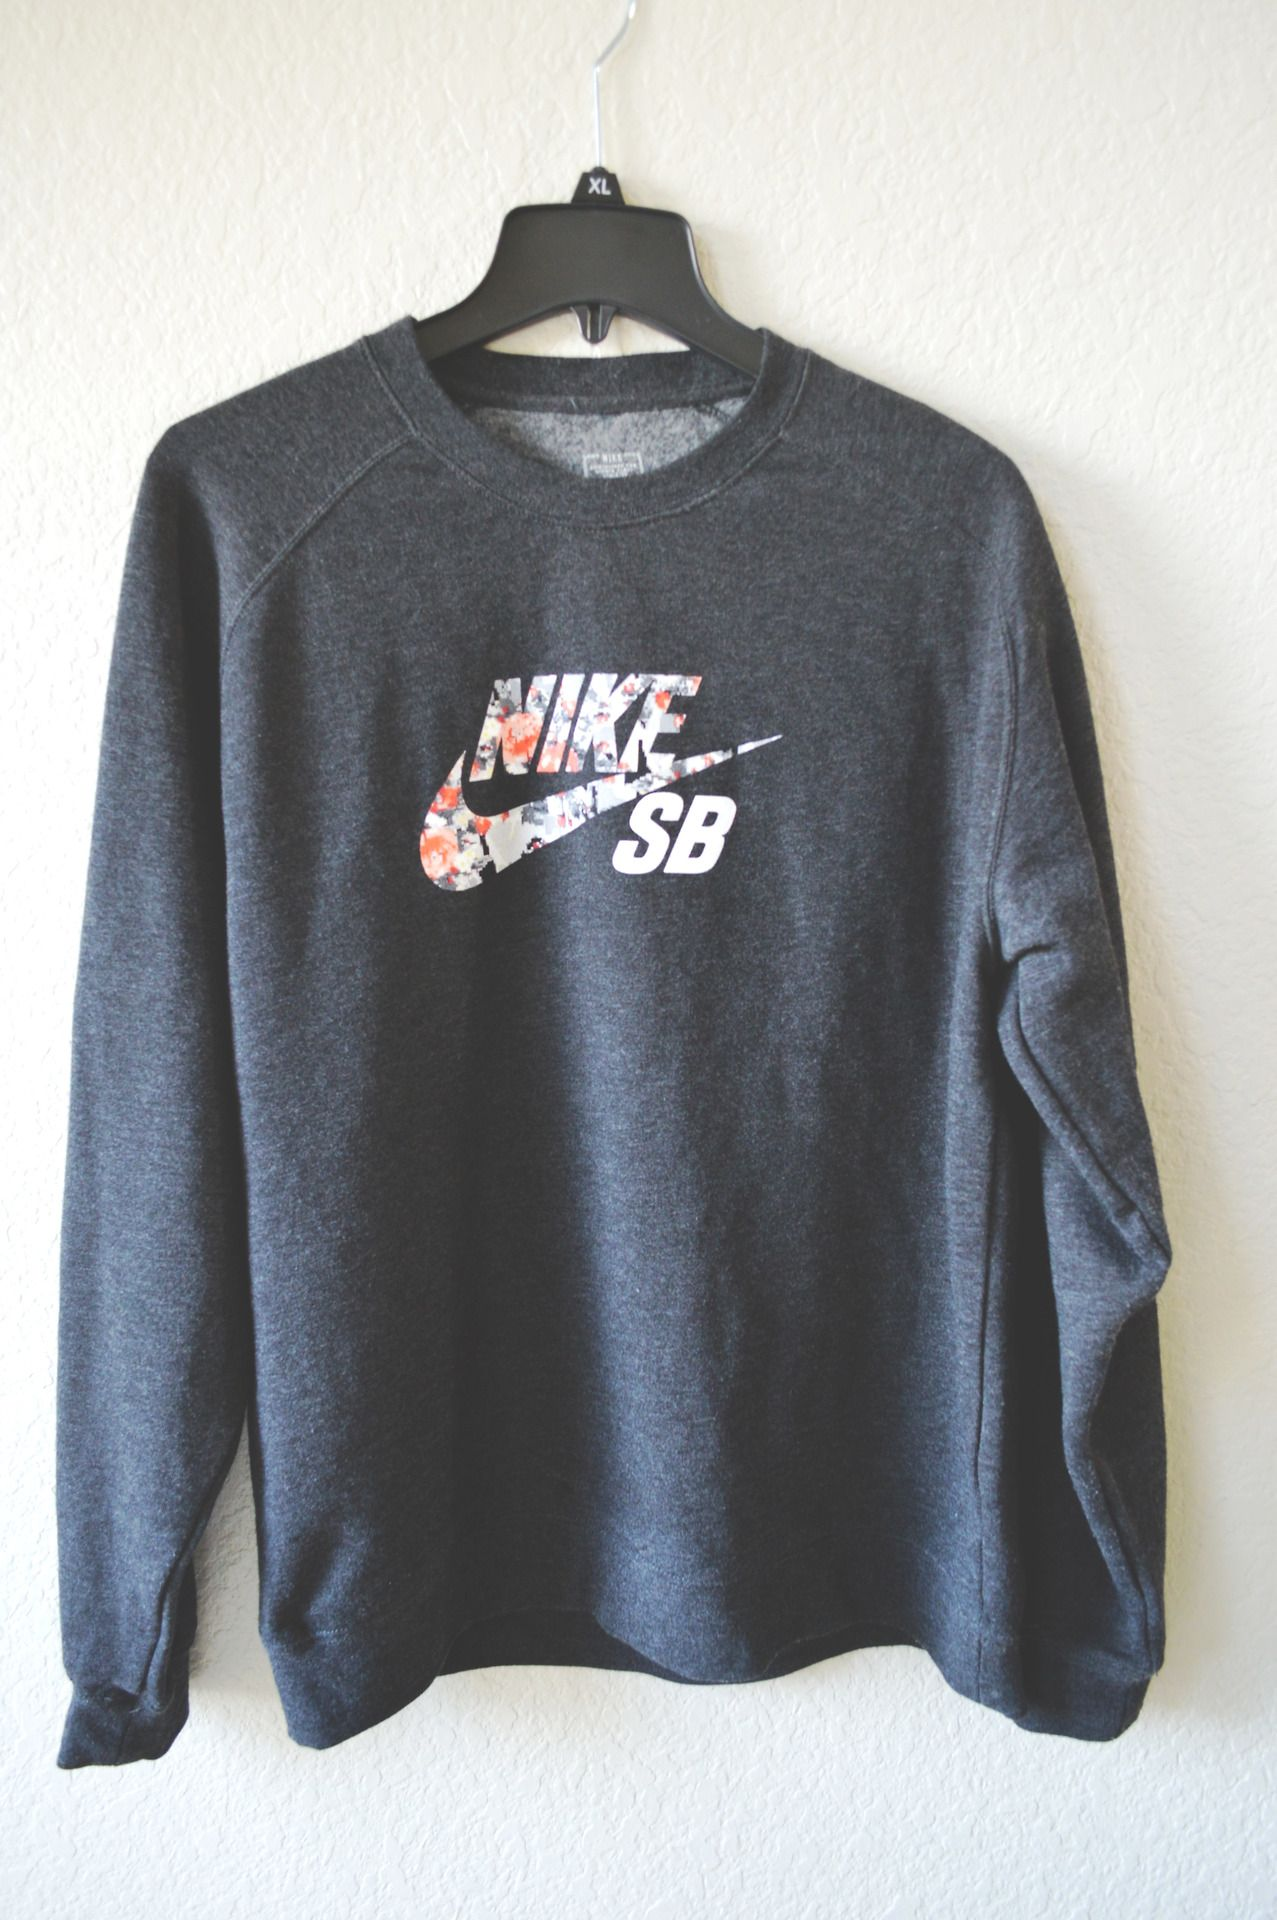 Floral Roshe Nike Swoosh Sweat-shirt